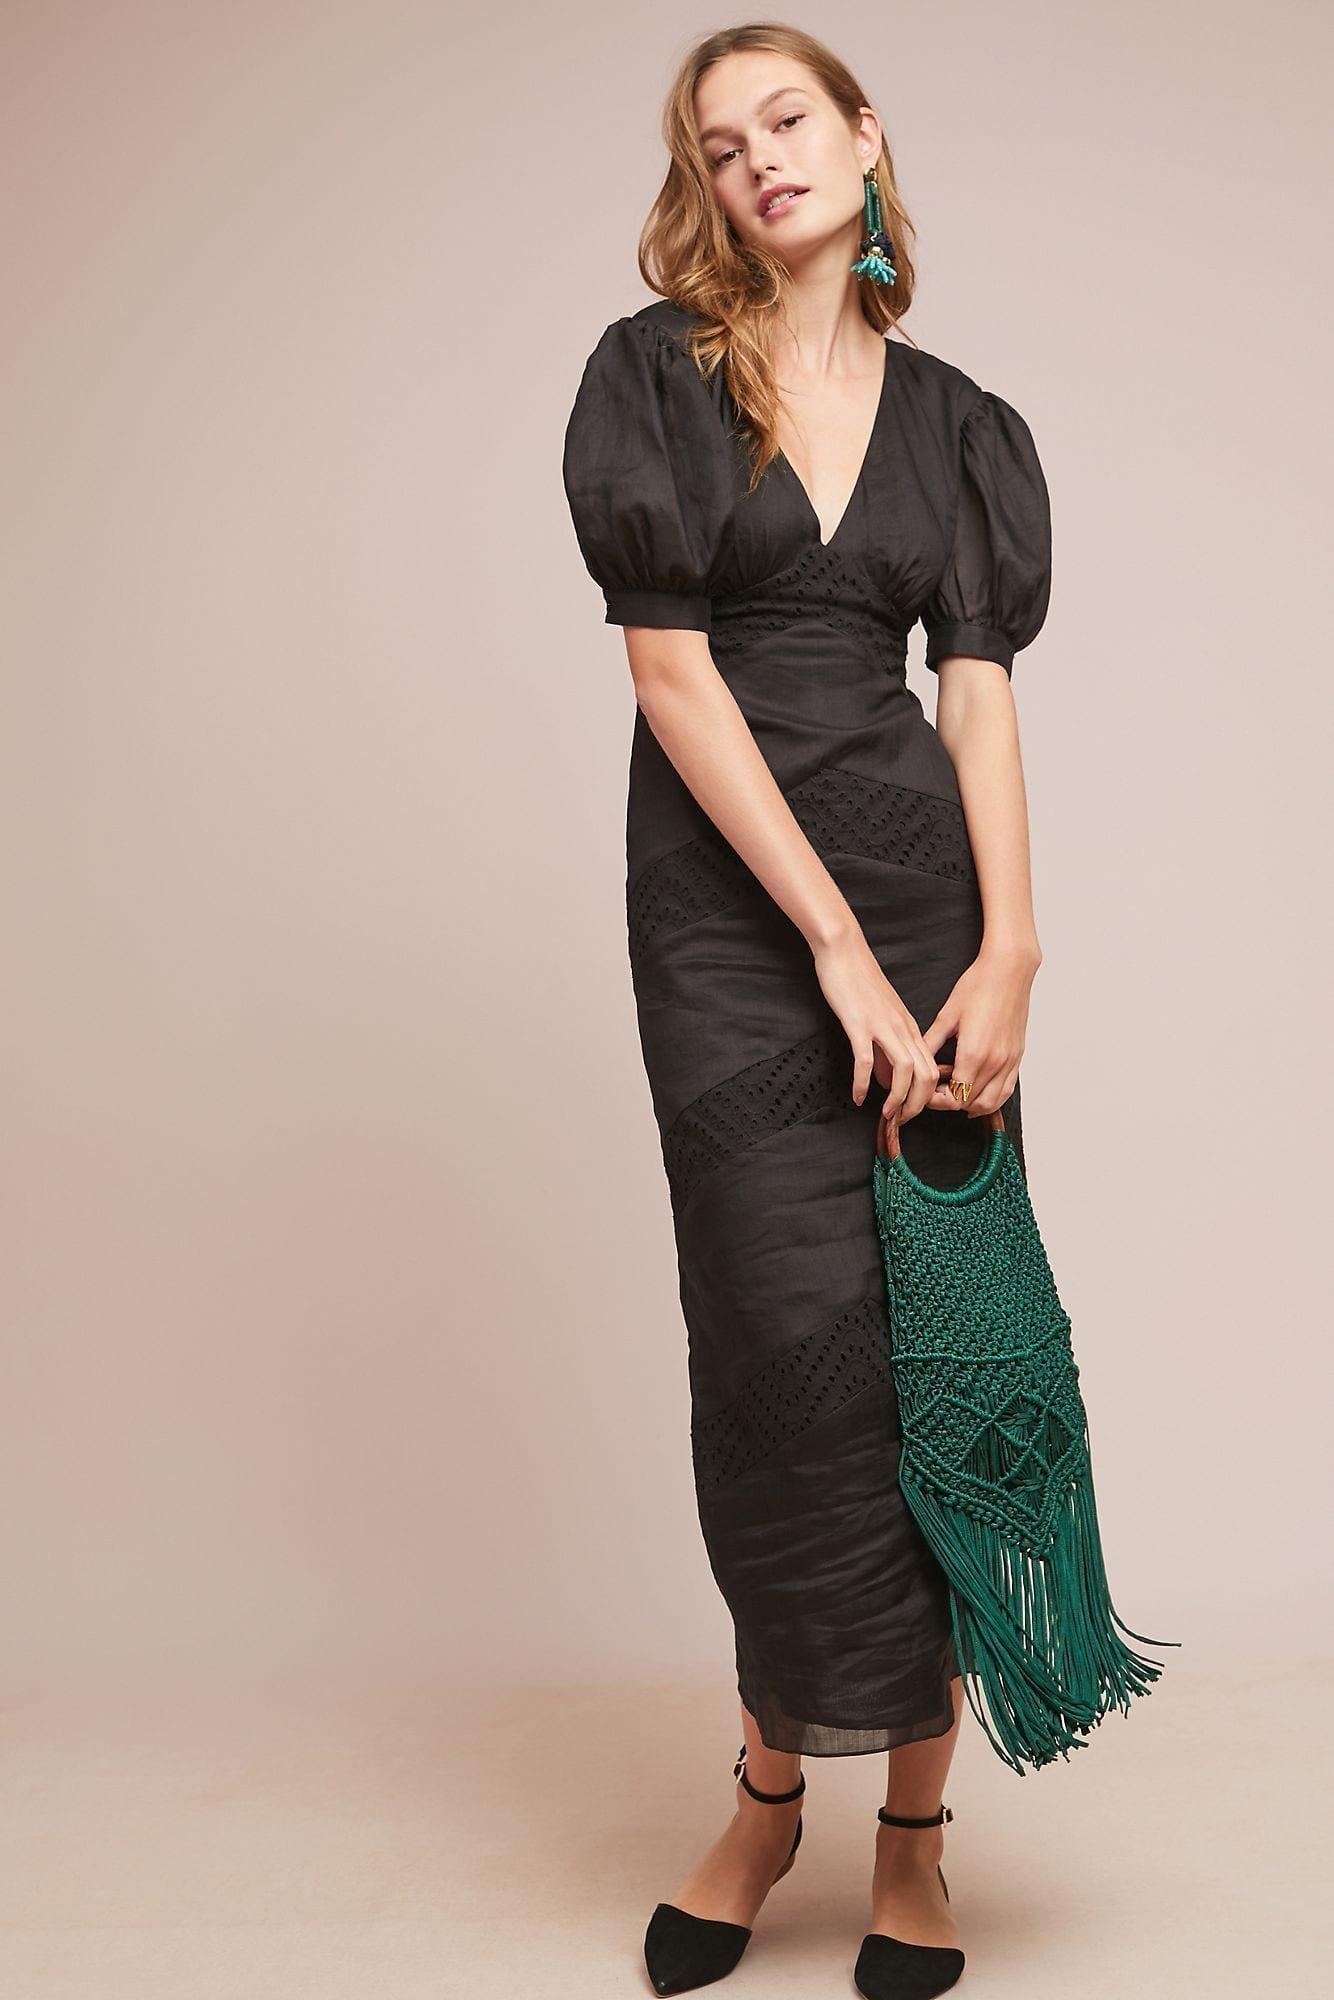 AZULU Blakely Maxi Black Dress